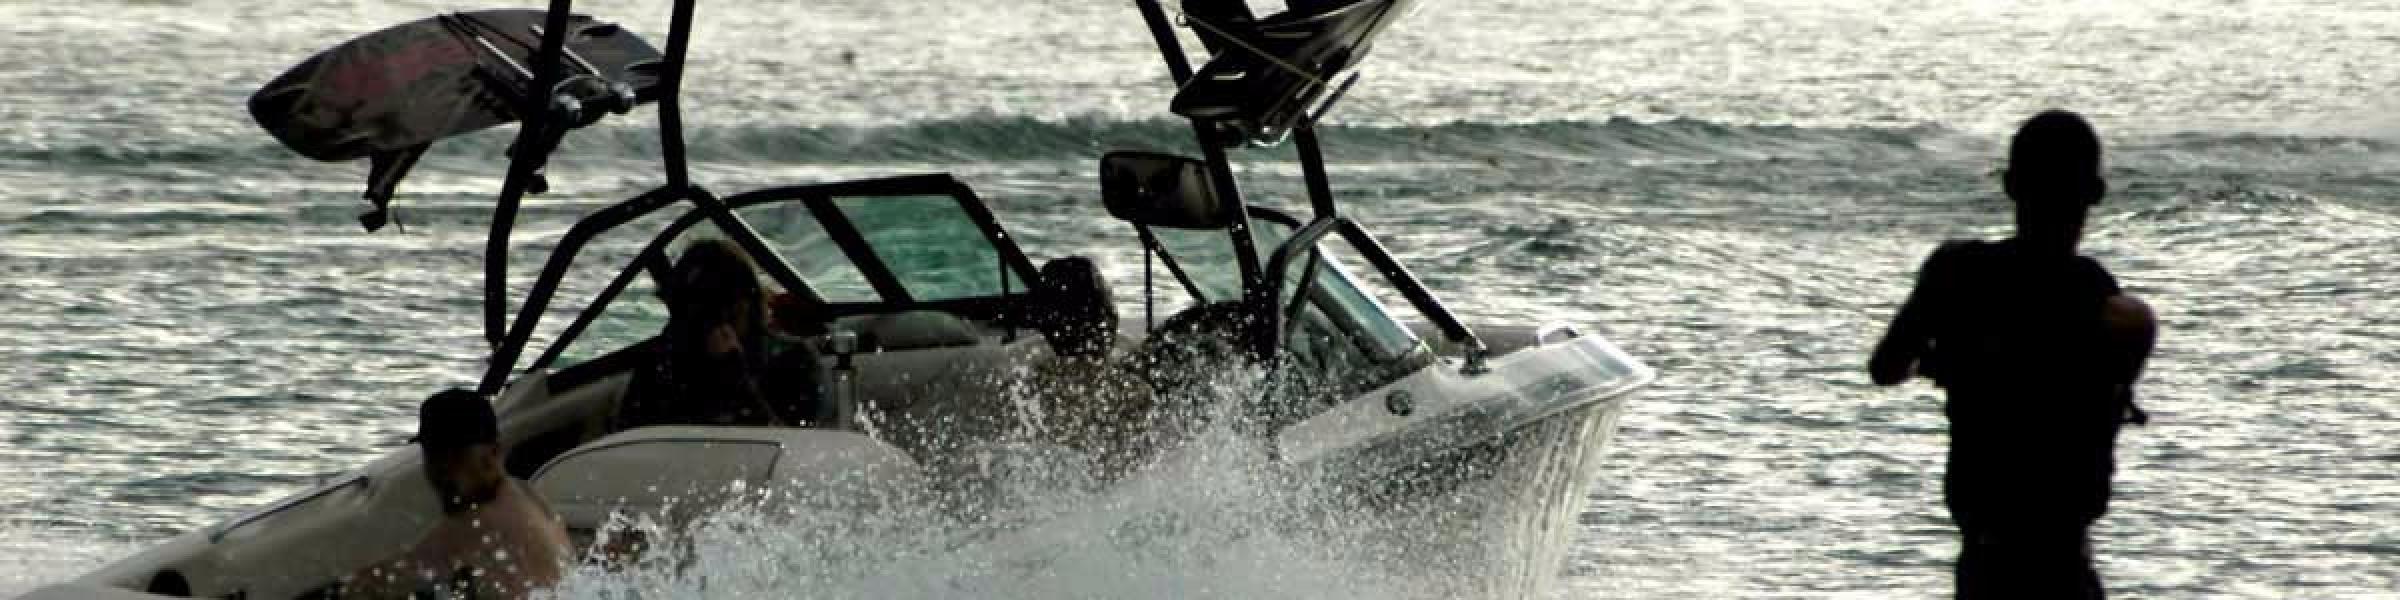 2015-wakeboard-silhouette-slider